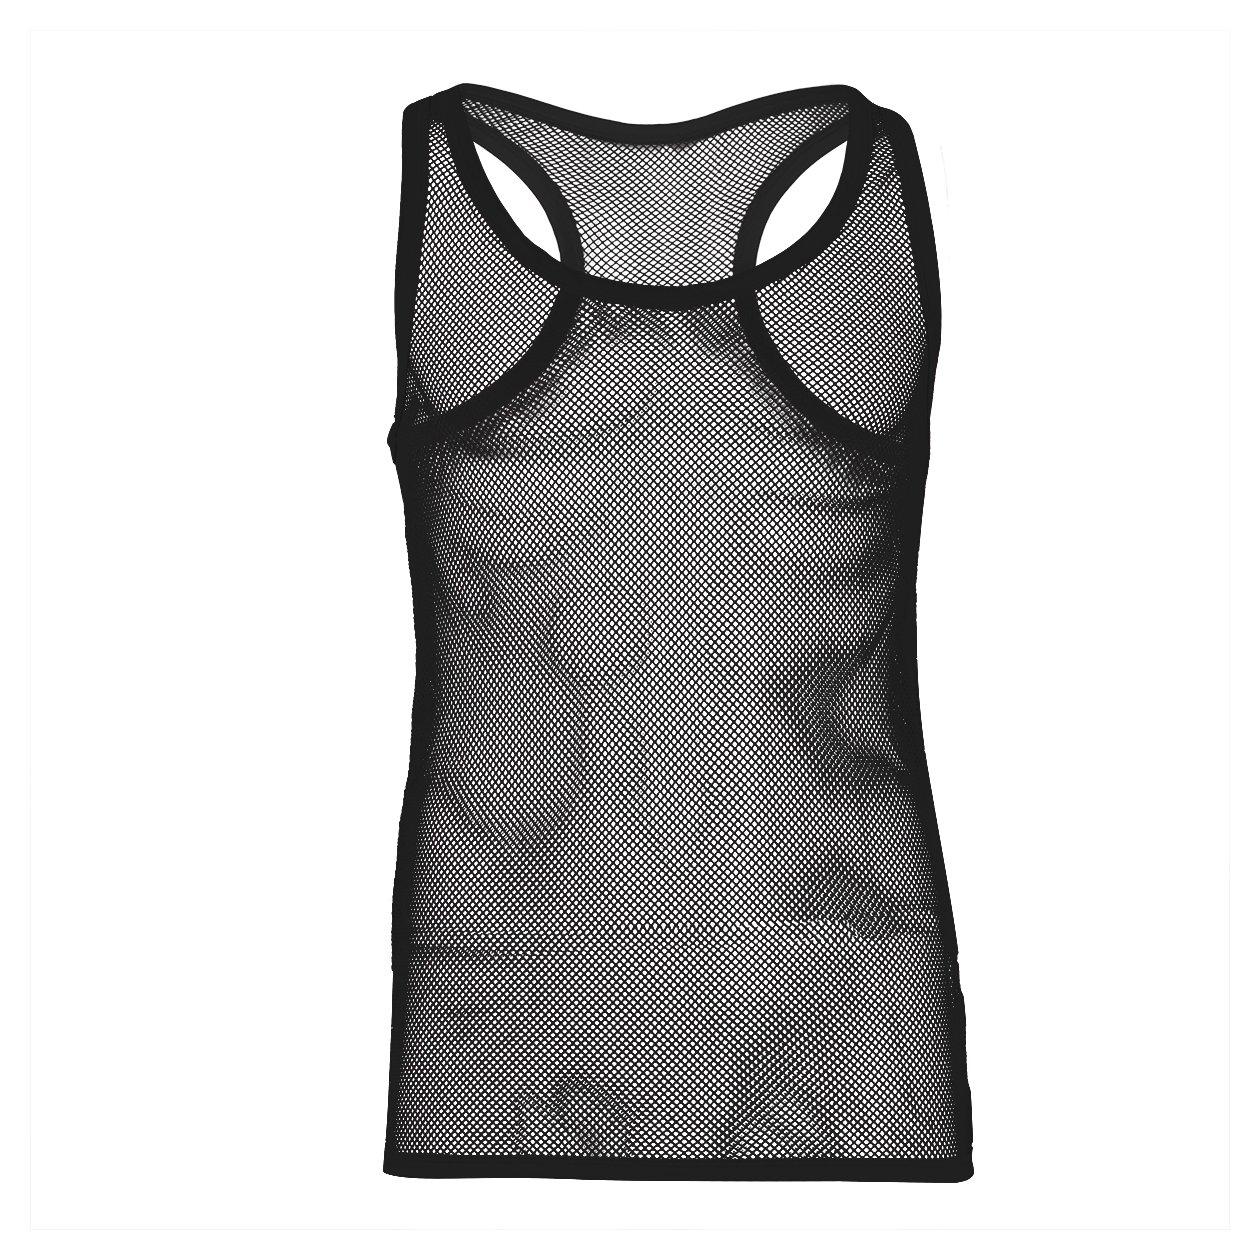 CHICTRY Mens Sleeveless Mesh See-Through Vest Tank Top Fishnet T-Shirt Undershirts